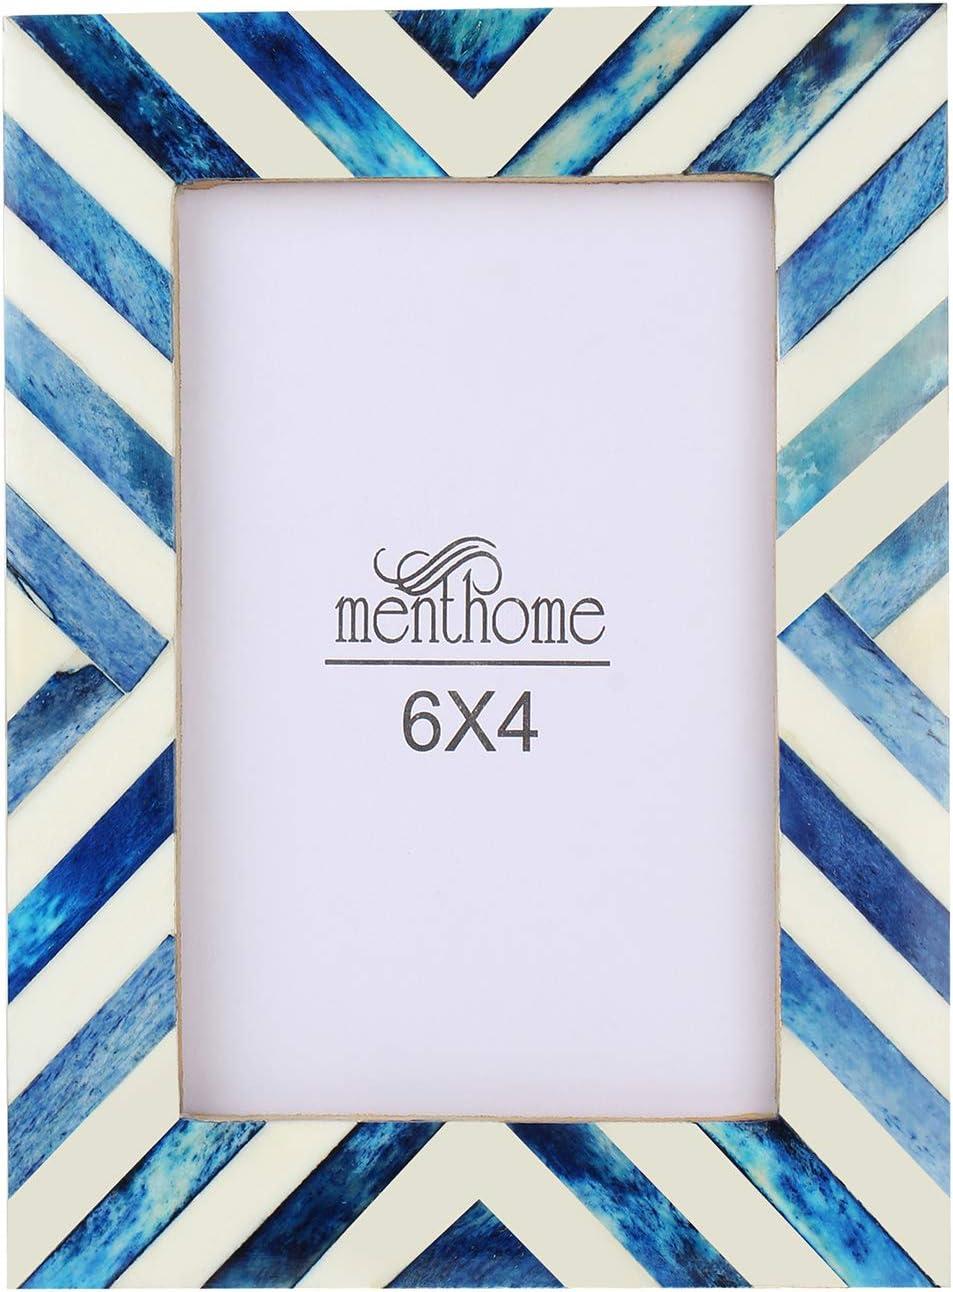 MENTHOME Blue 6x4 Picture Photo Frame Chevron Herringbone Art Wall Decor (Blue Chevron Herringbone, 6X4)